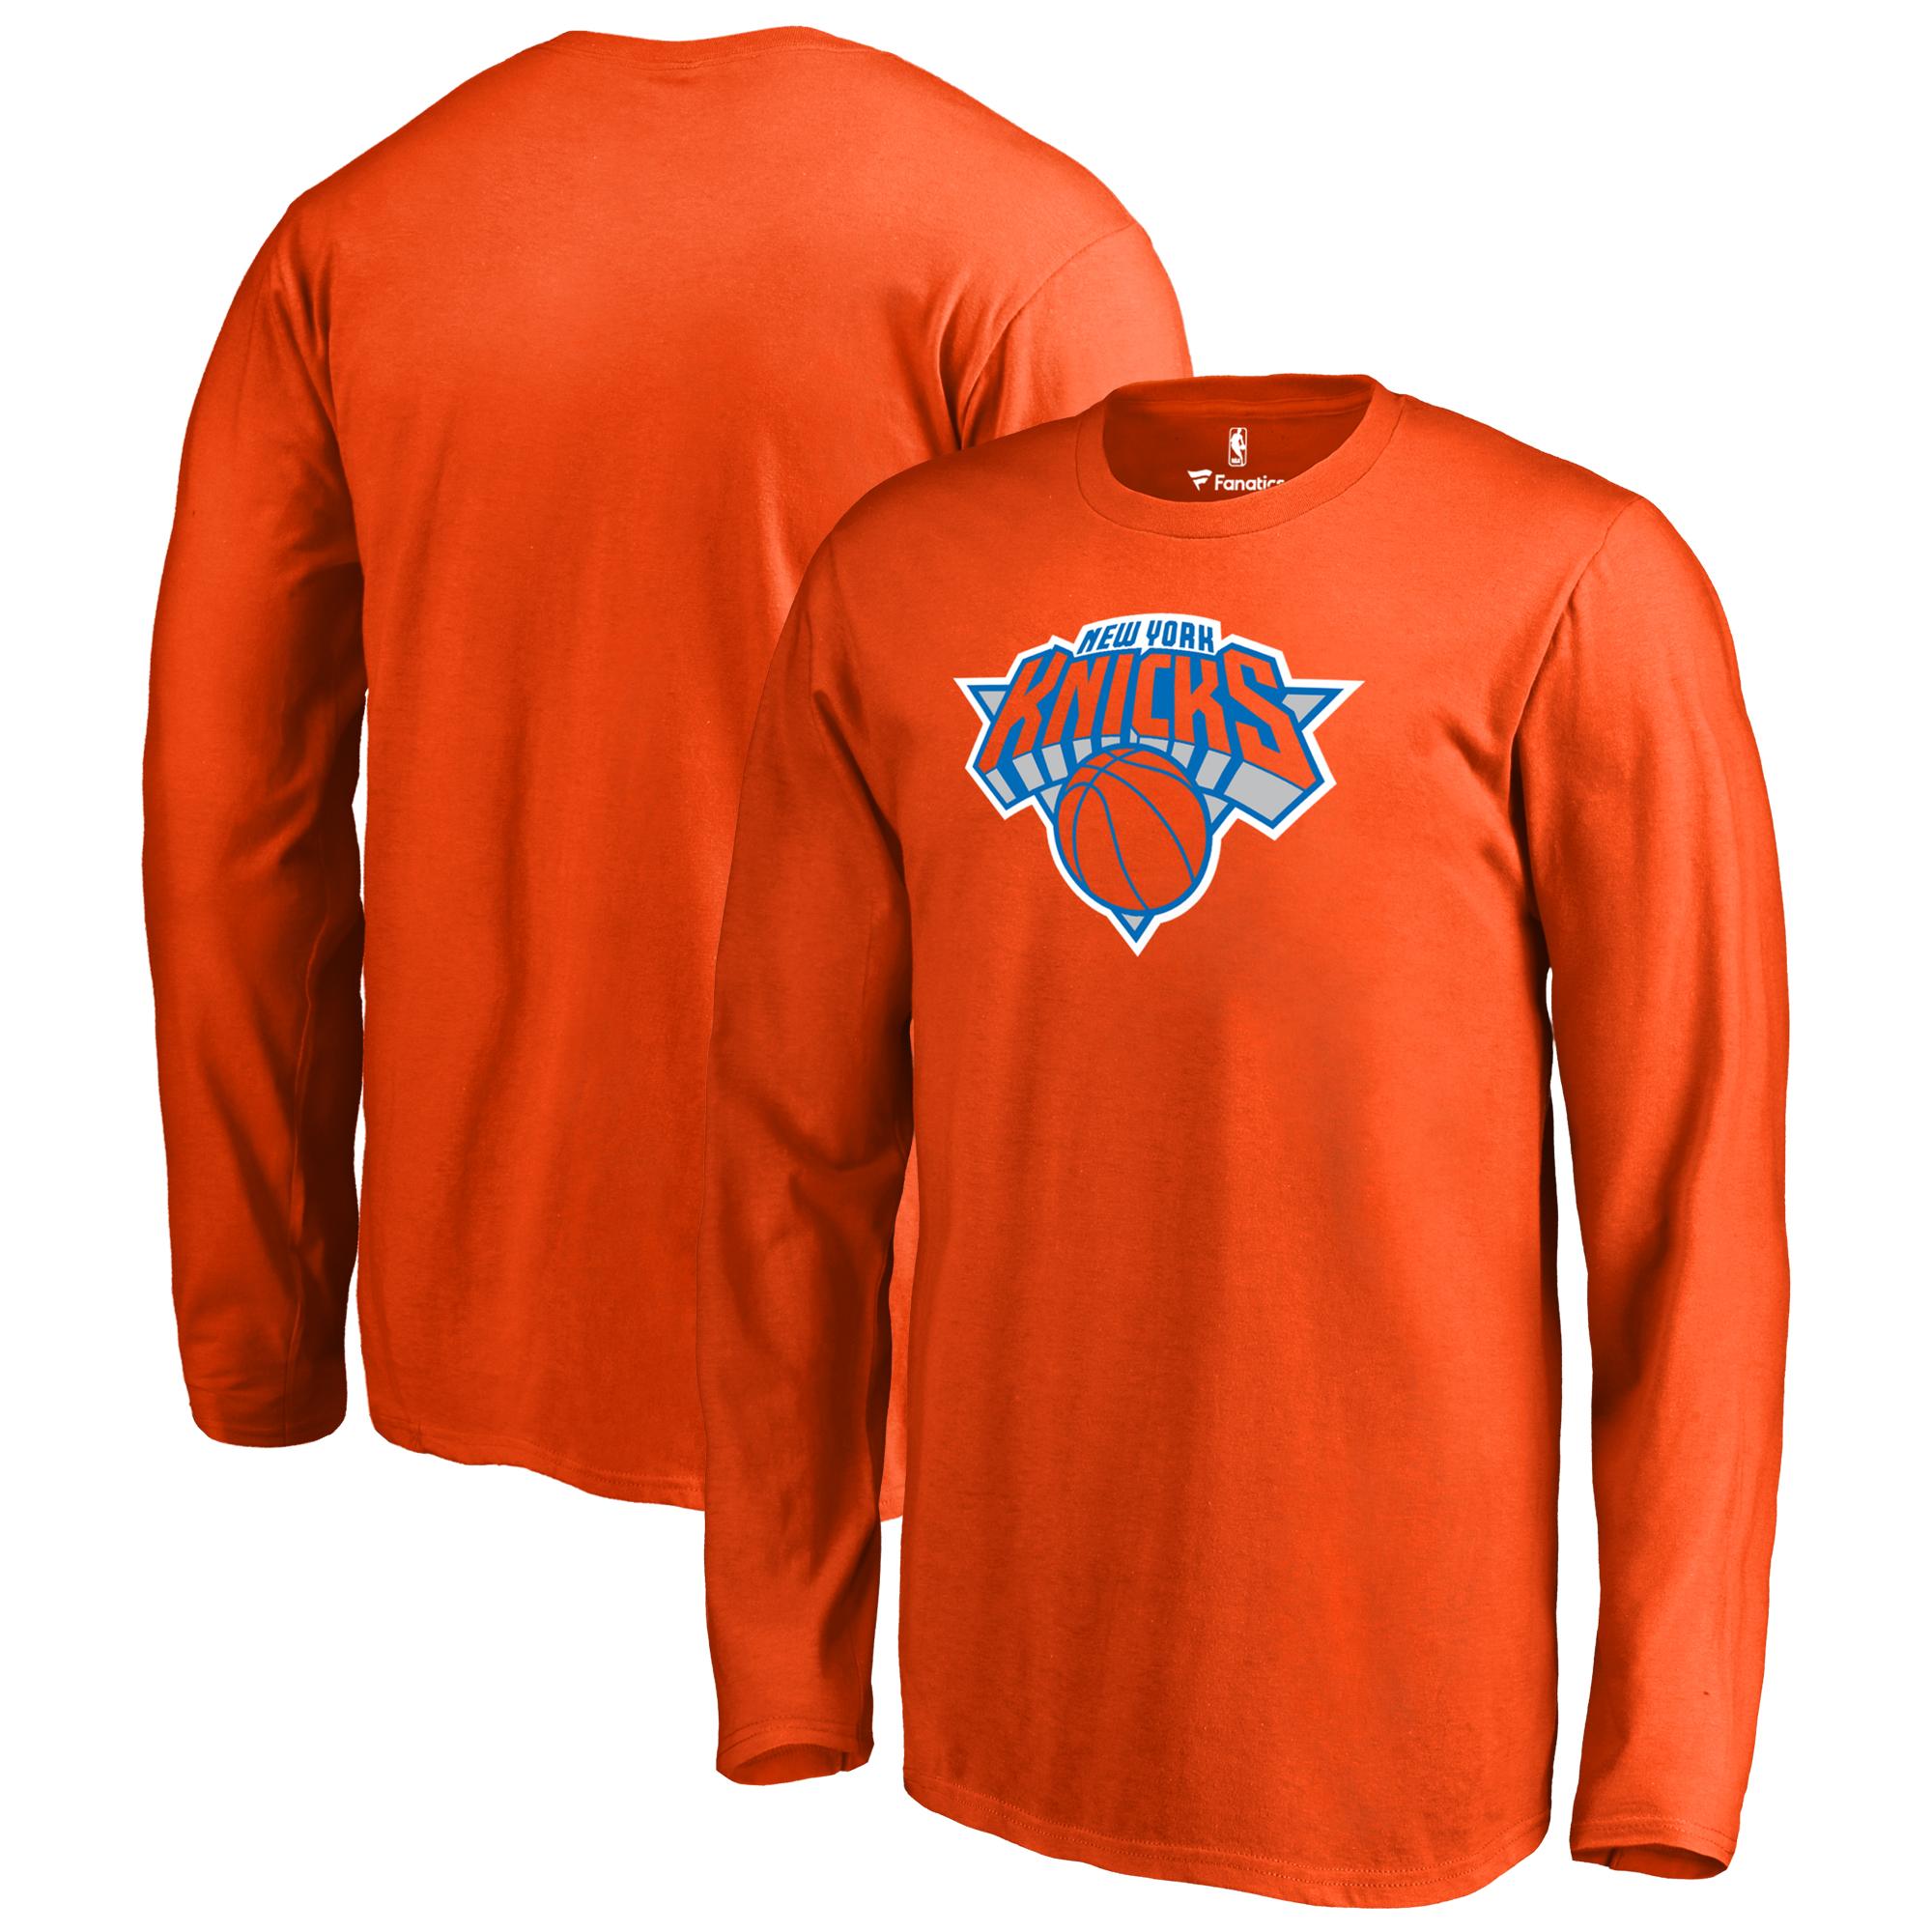 New York Knicks Fanatics Branded Youth Primary Logo Long Sleeve T-Shirt - Orange